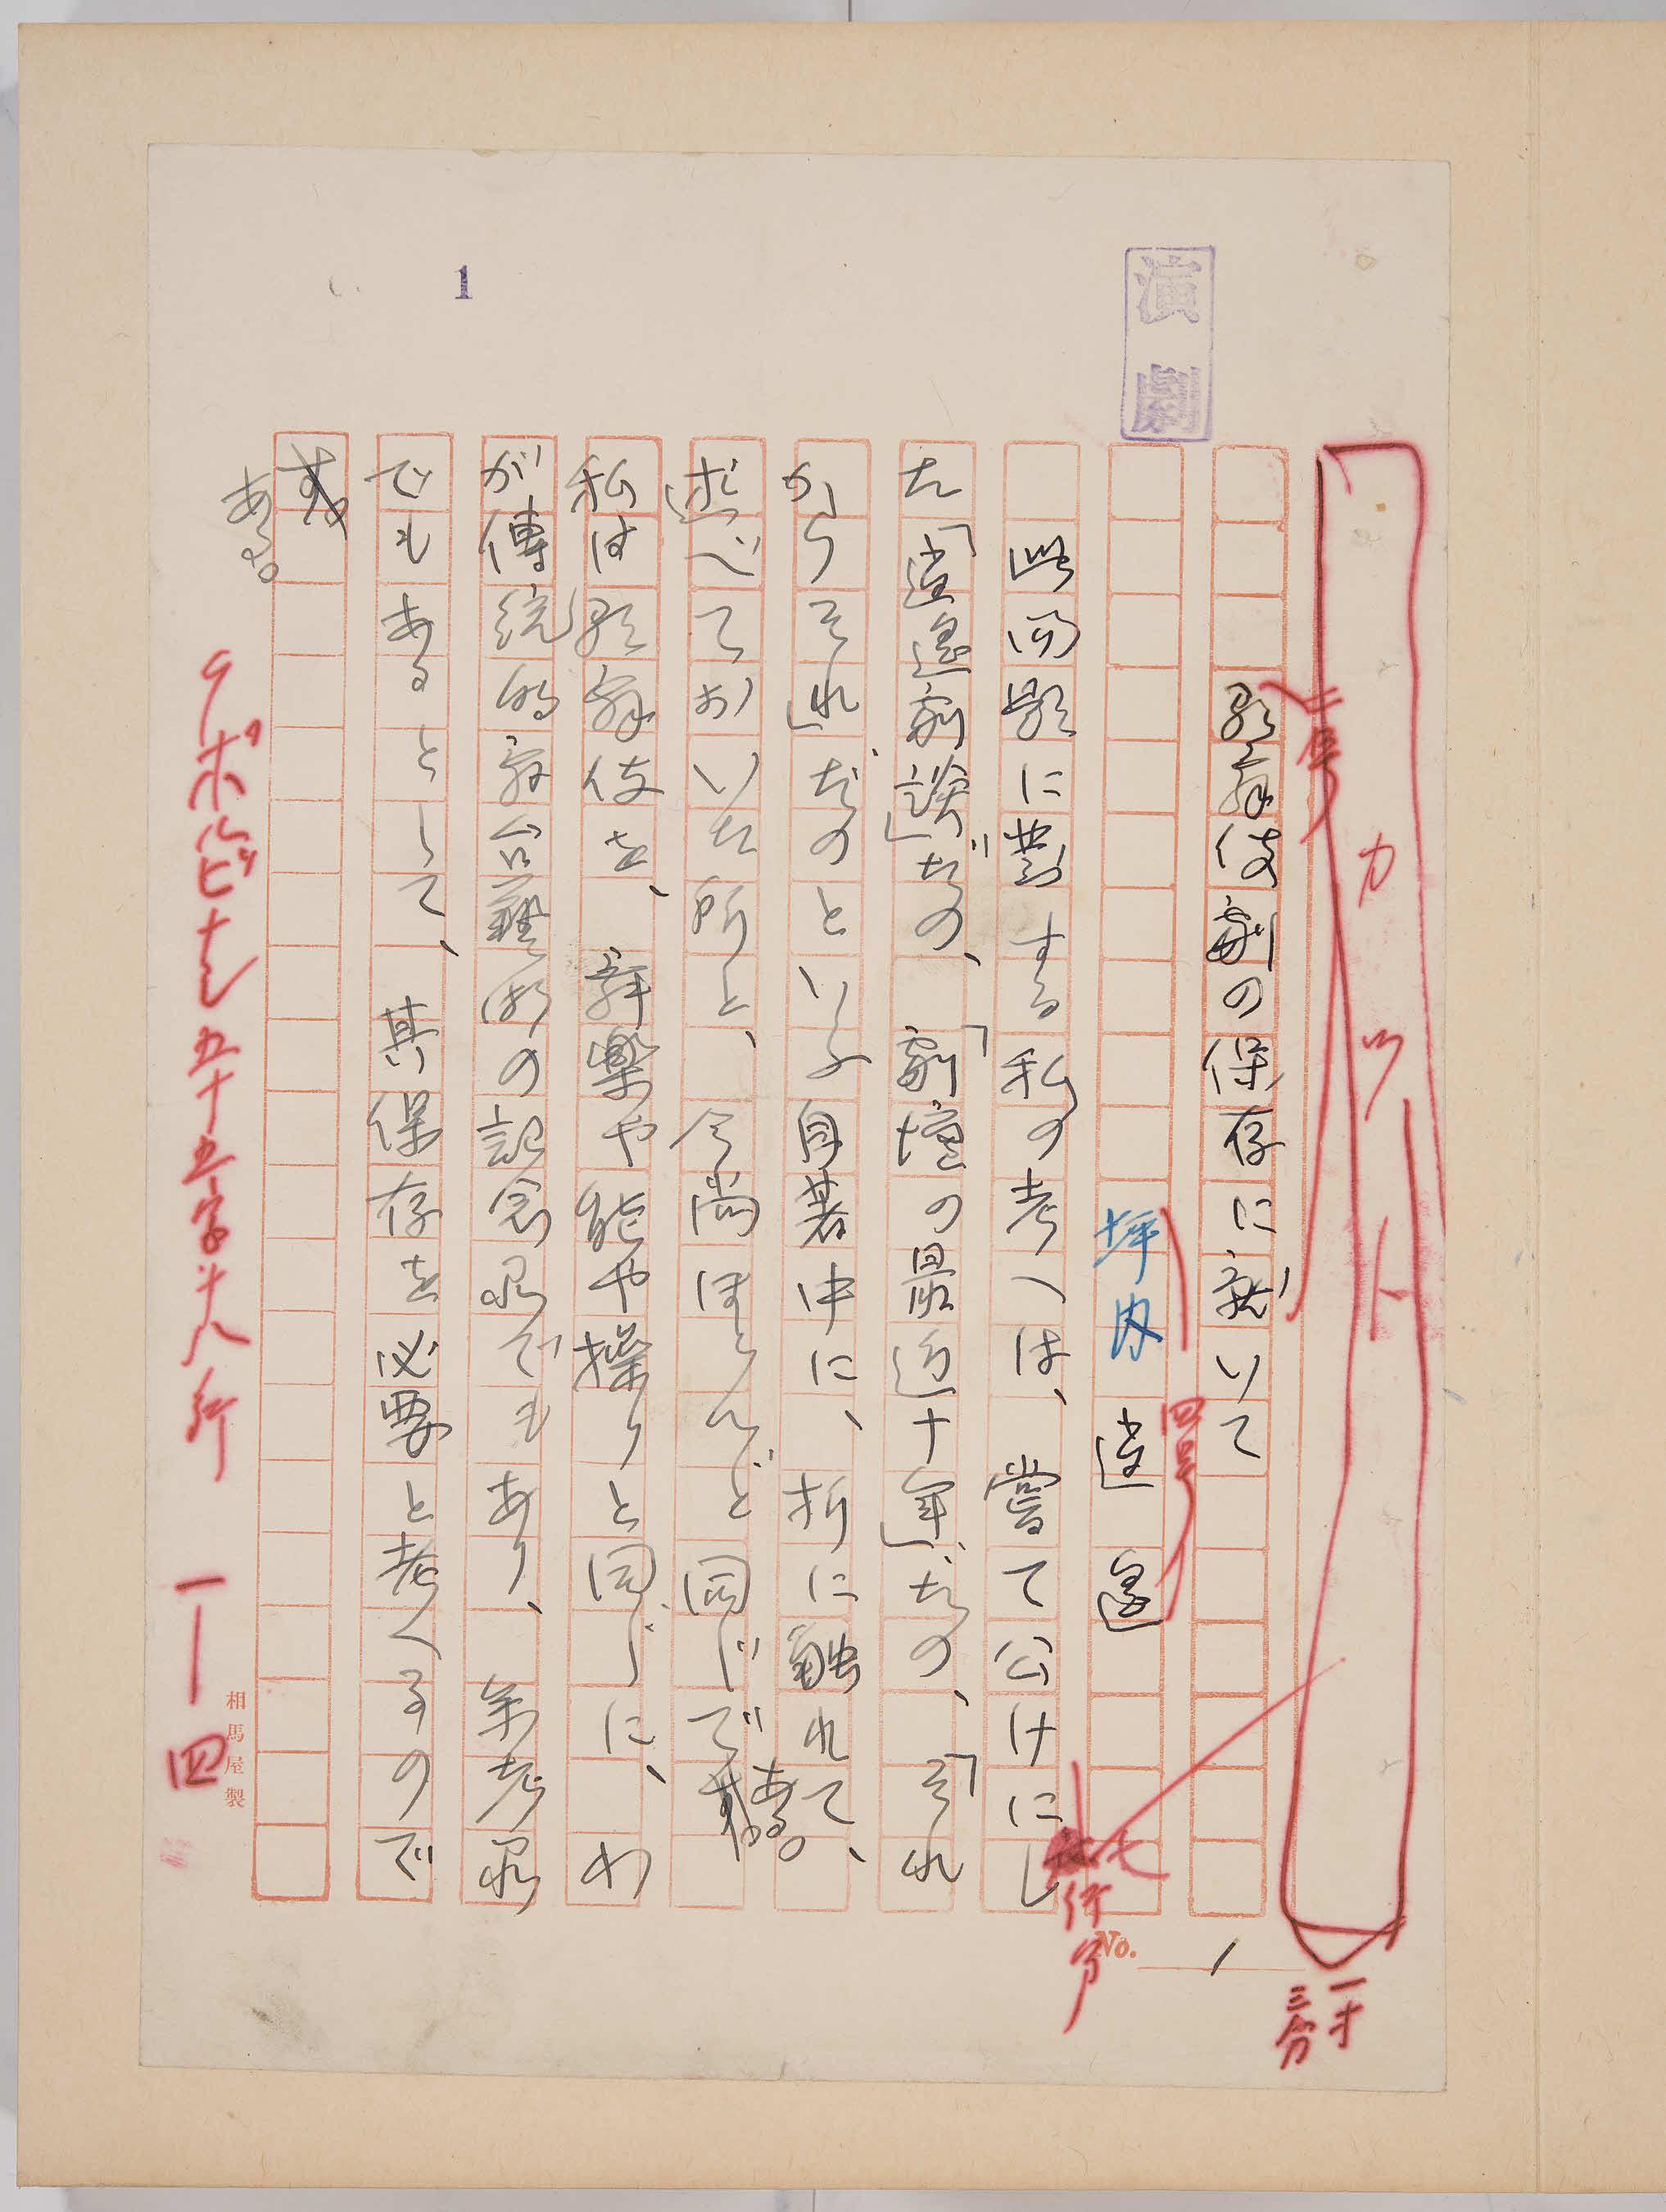 B2.1 歌舞伎劇の保存に就いて Kabukigeki no hozon ni tsuite